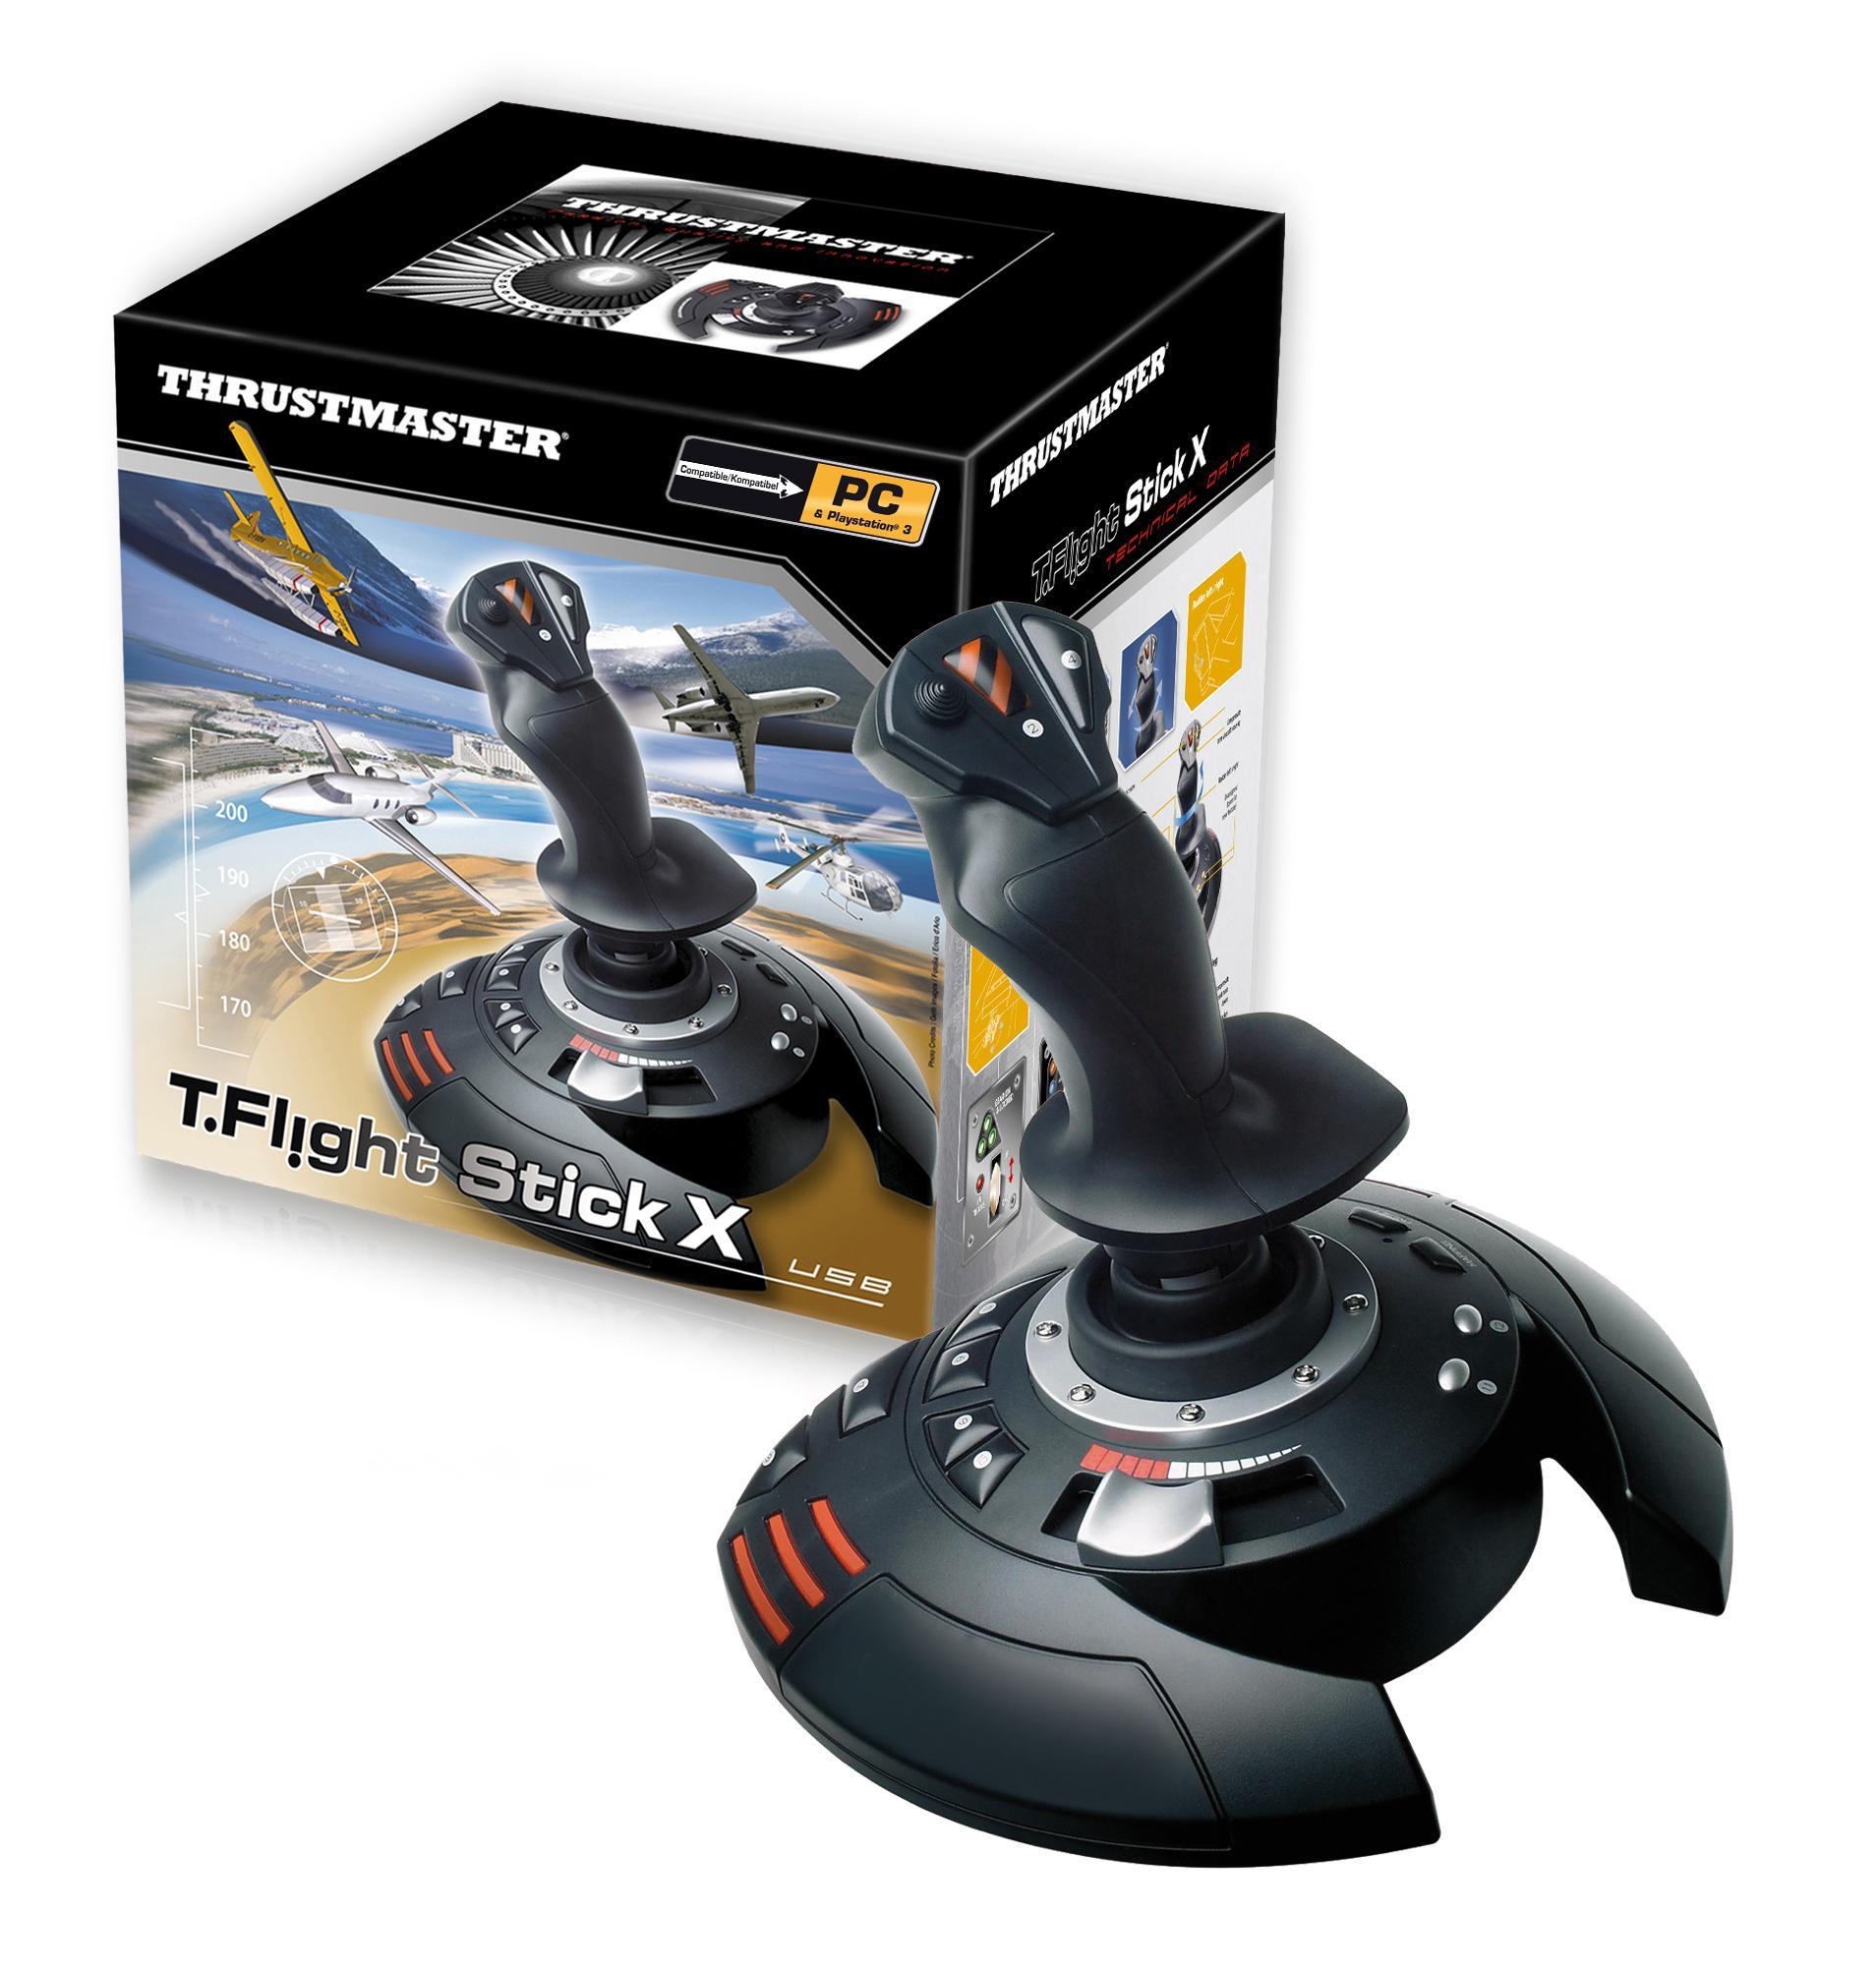 Amazon com: Thrustmaster T-Flight Stick X PS3: PC: Video Games